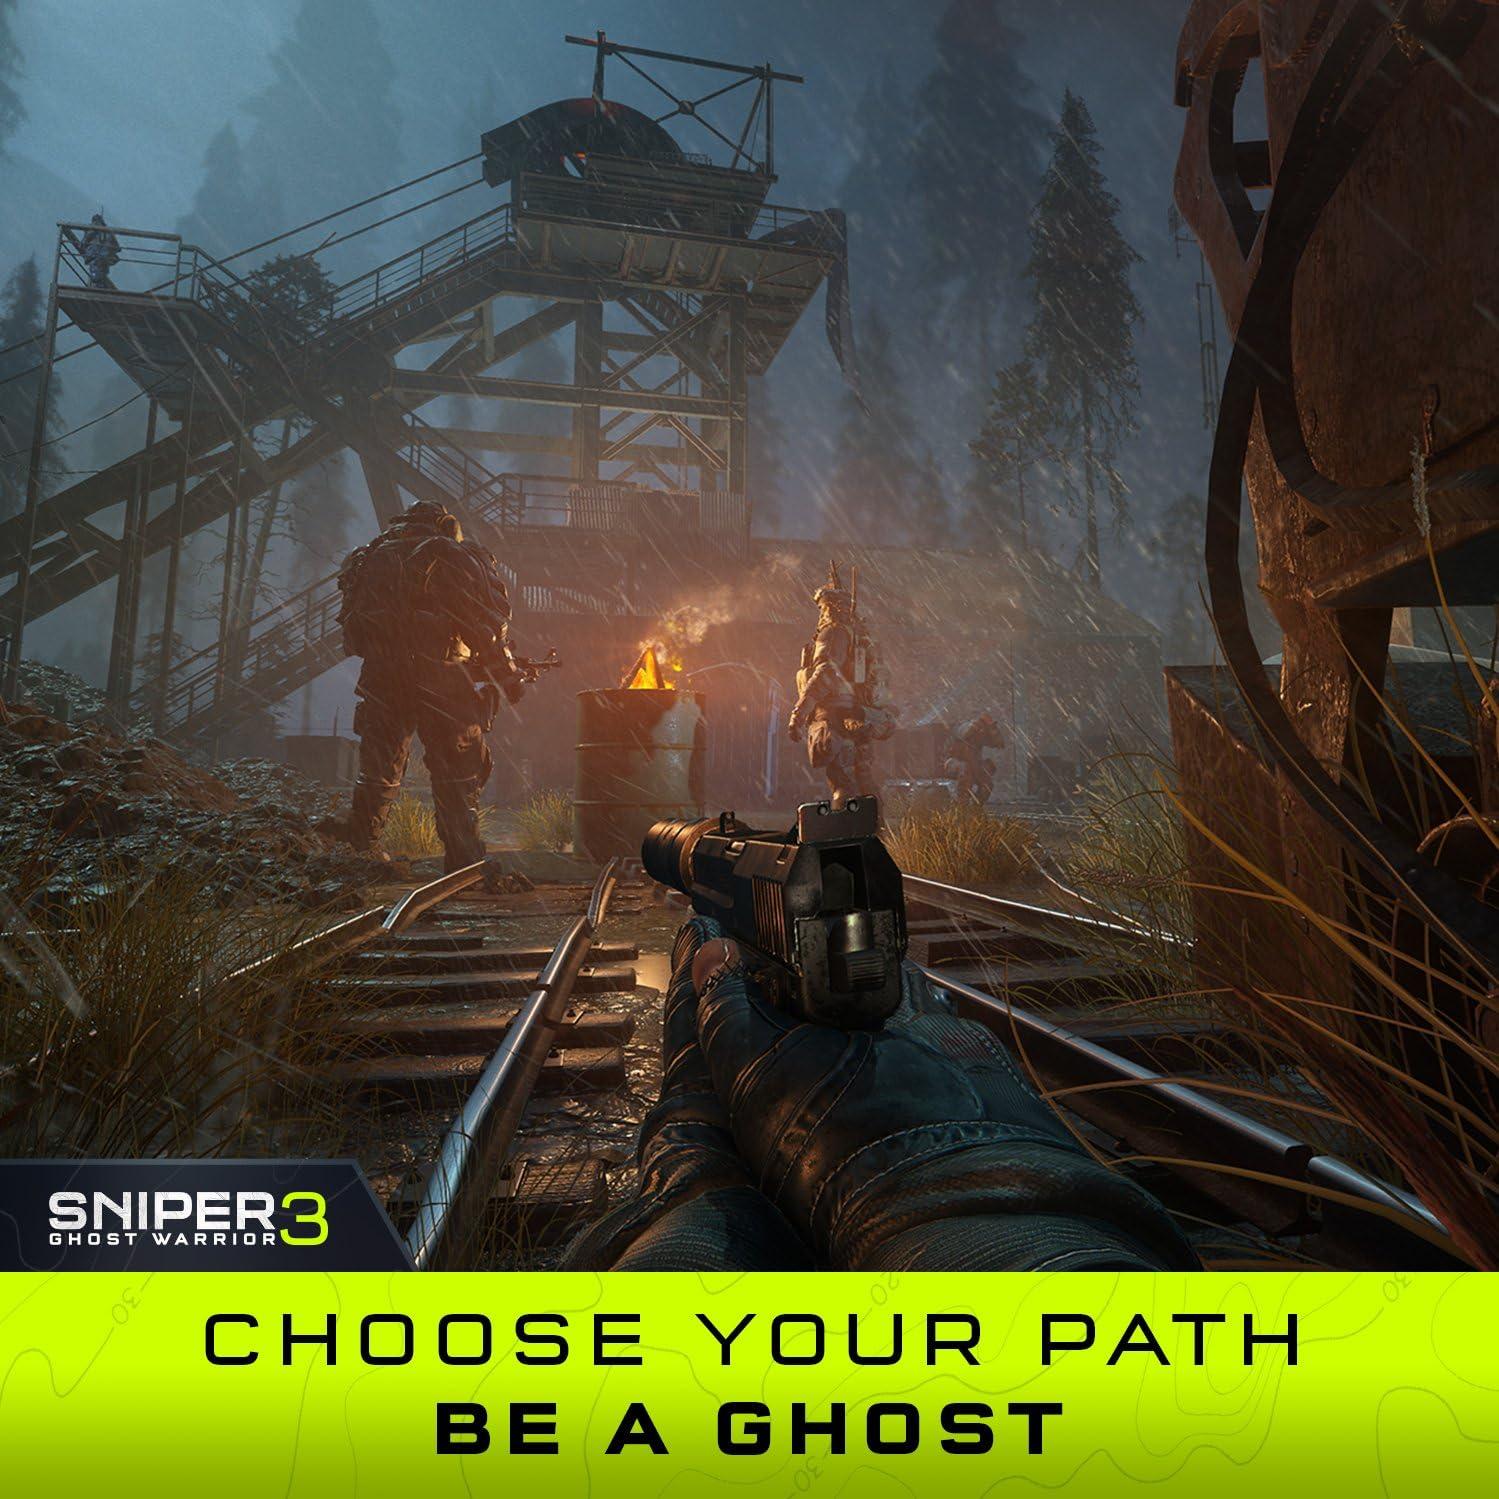 sniper ghost warrior 3 download kickass